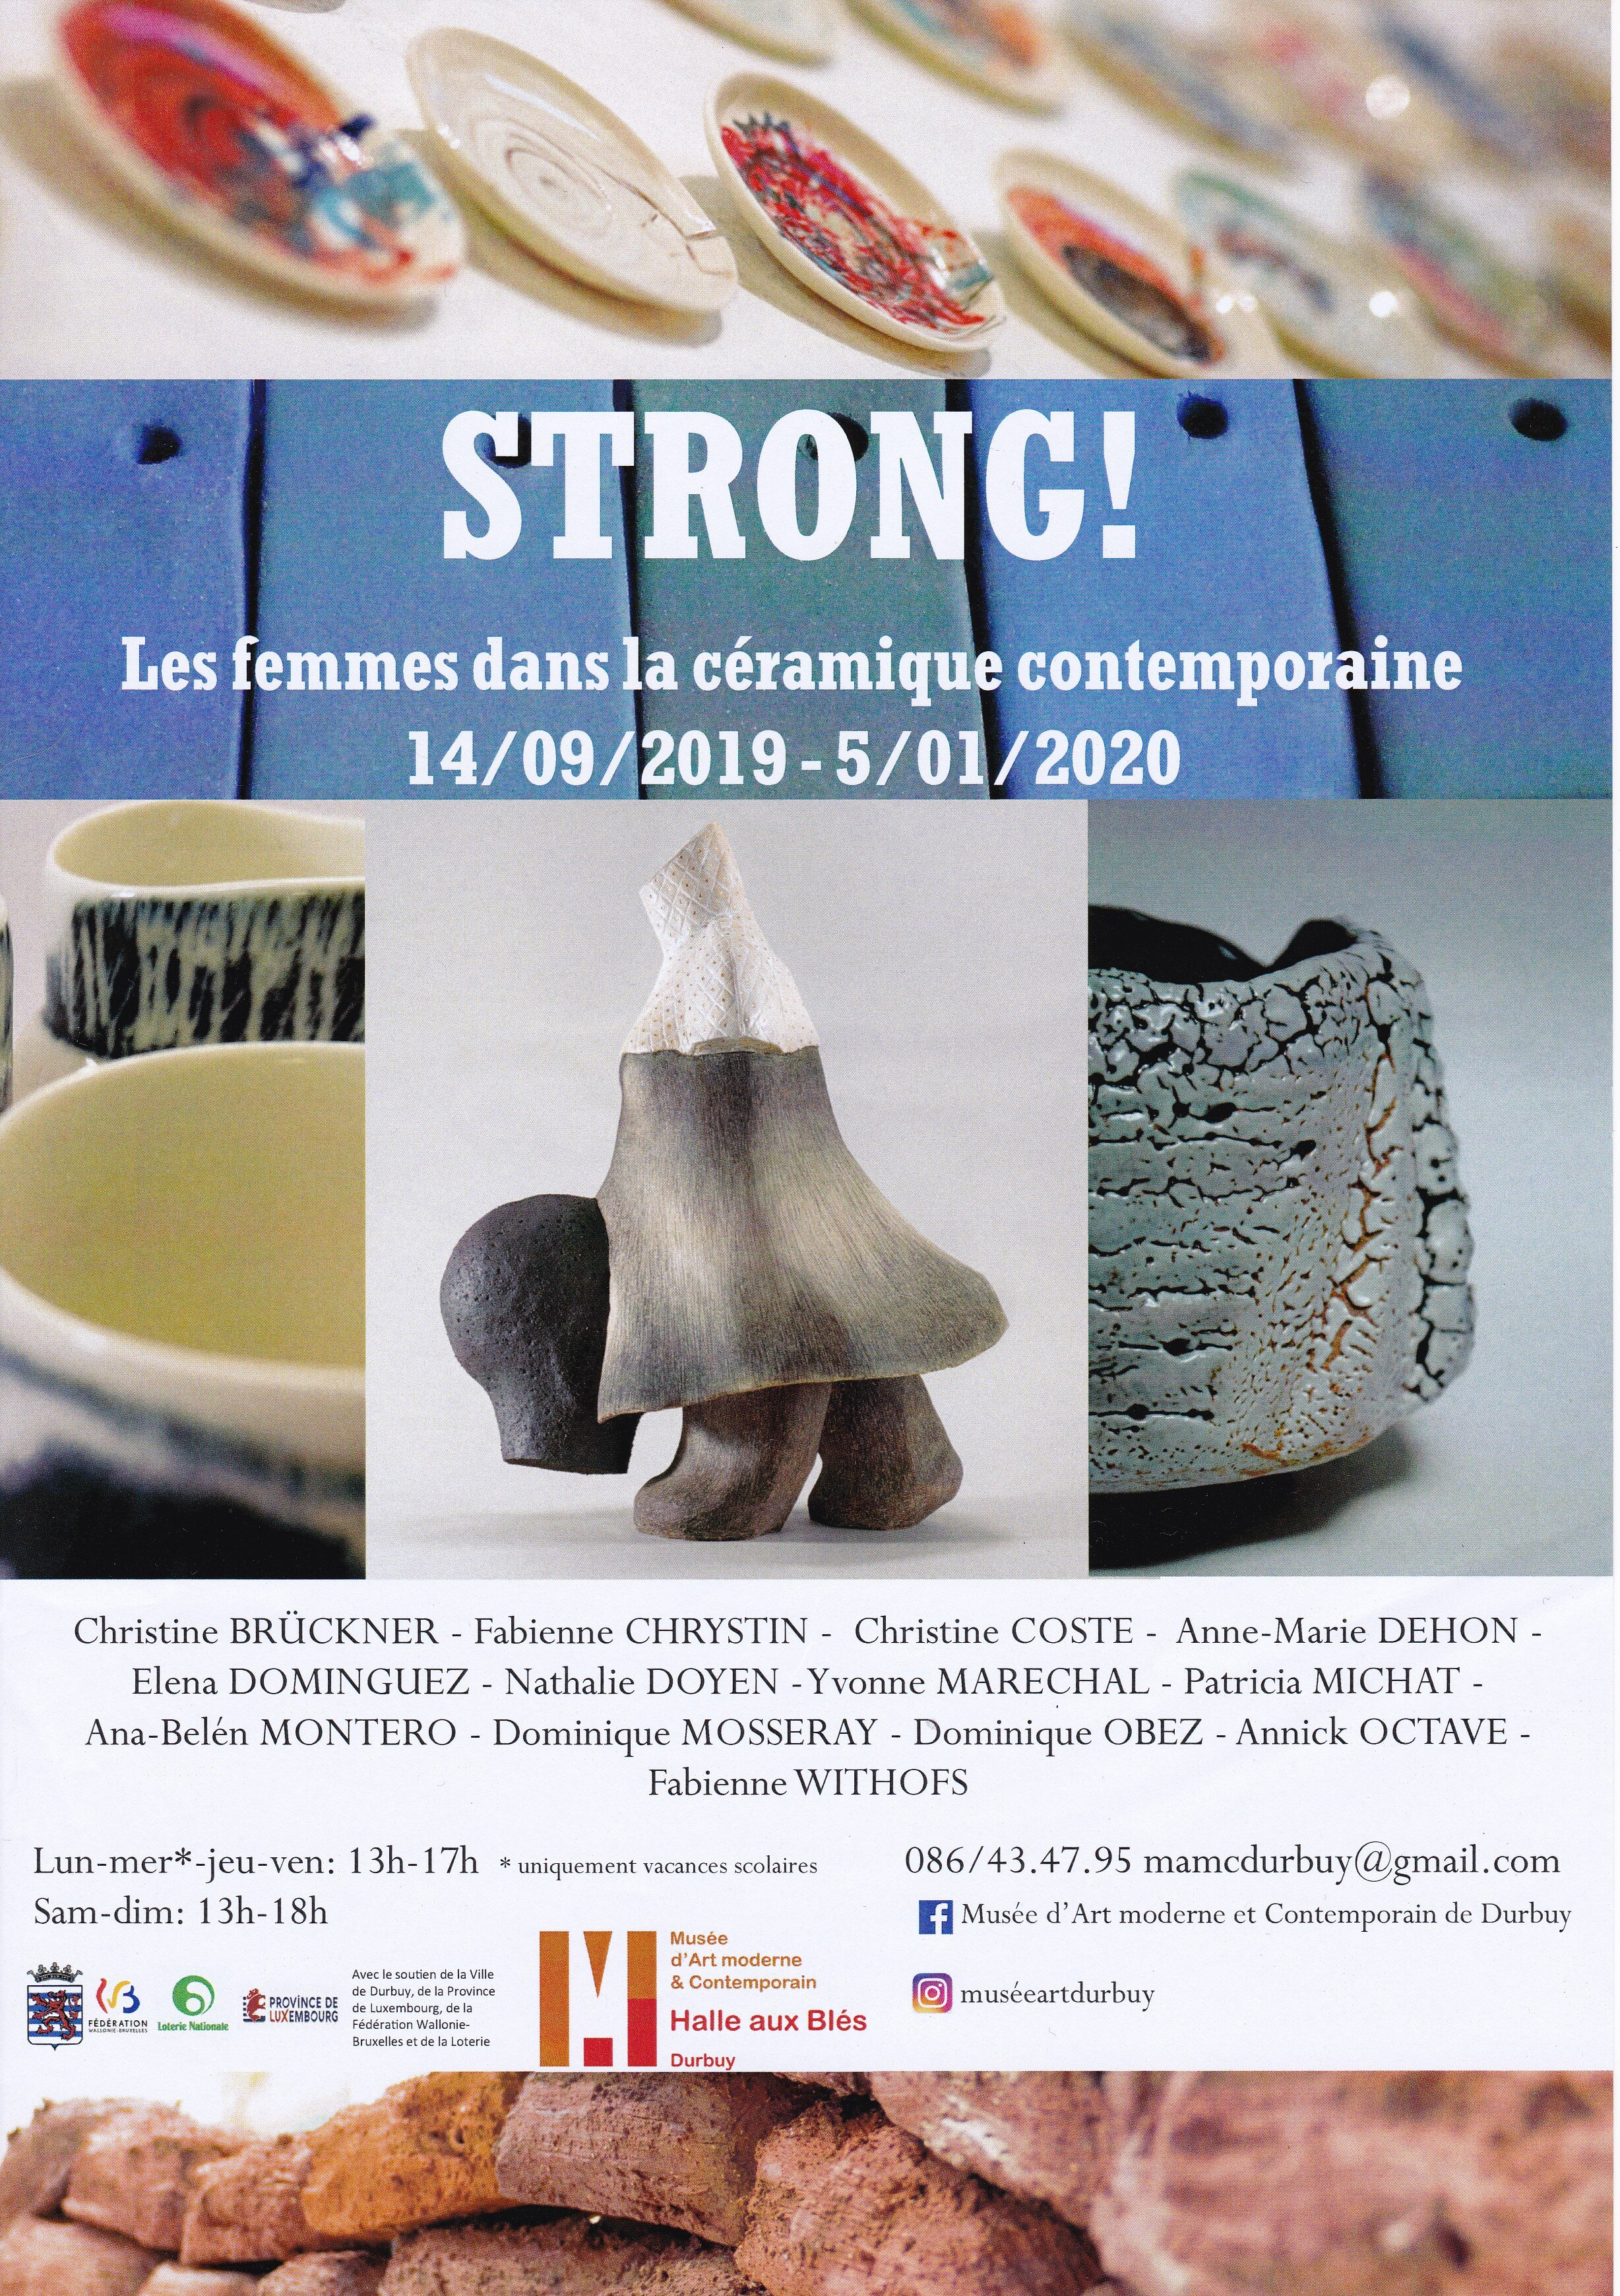 Affiche Strong exposition céramique Durbuy 2019